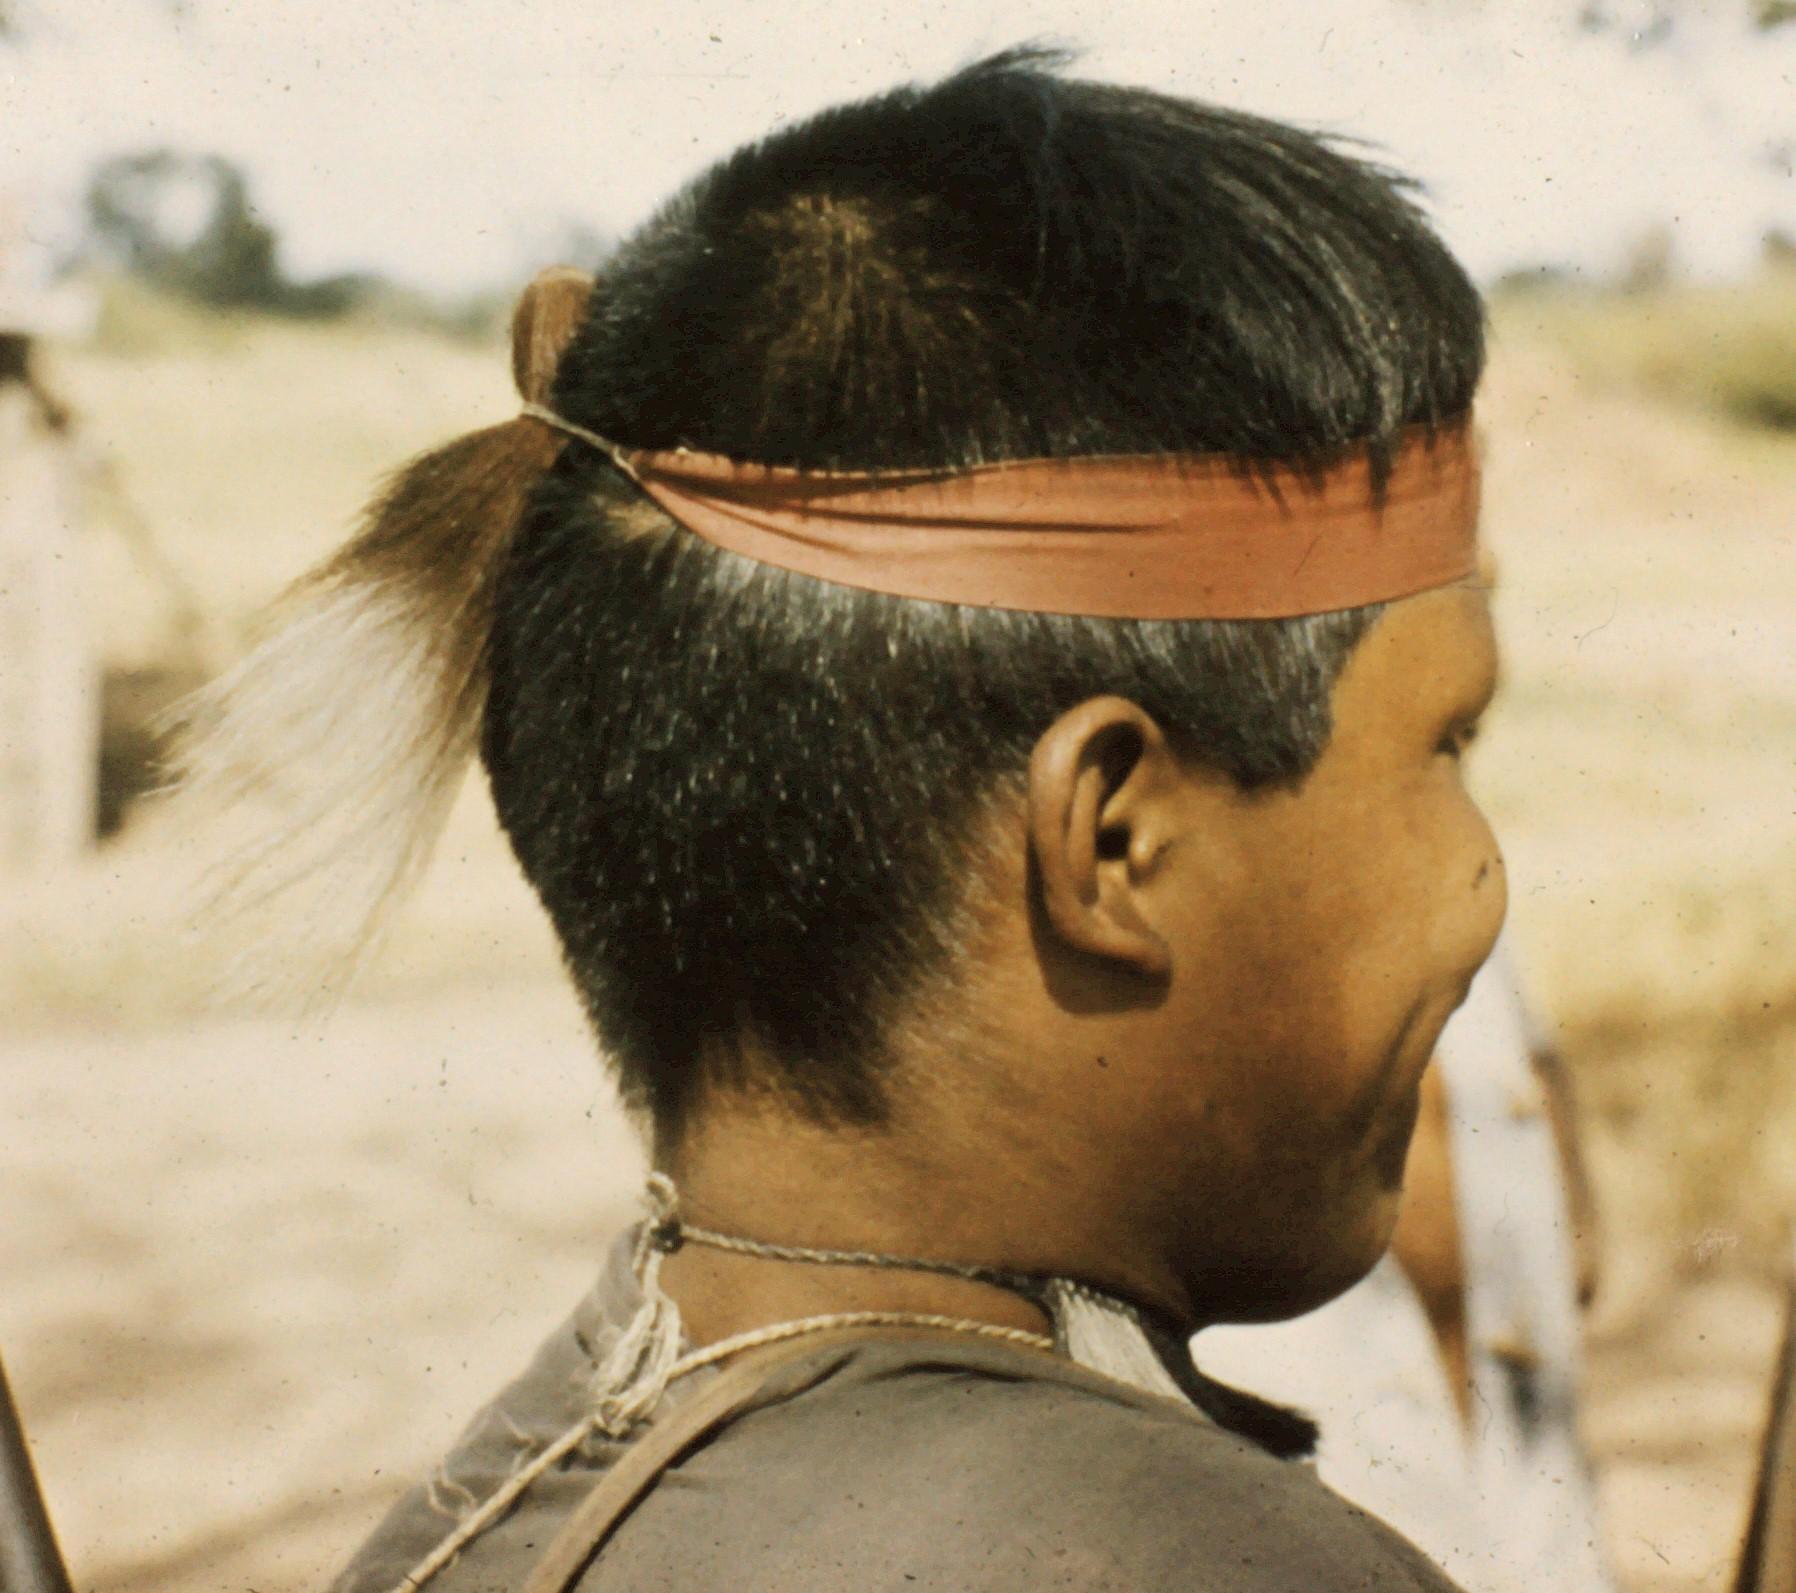 Ayoré man with hair necklace and headband.